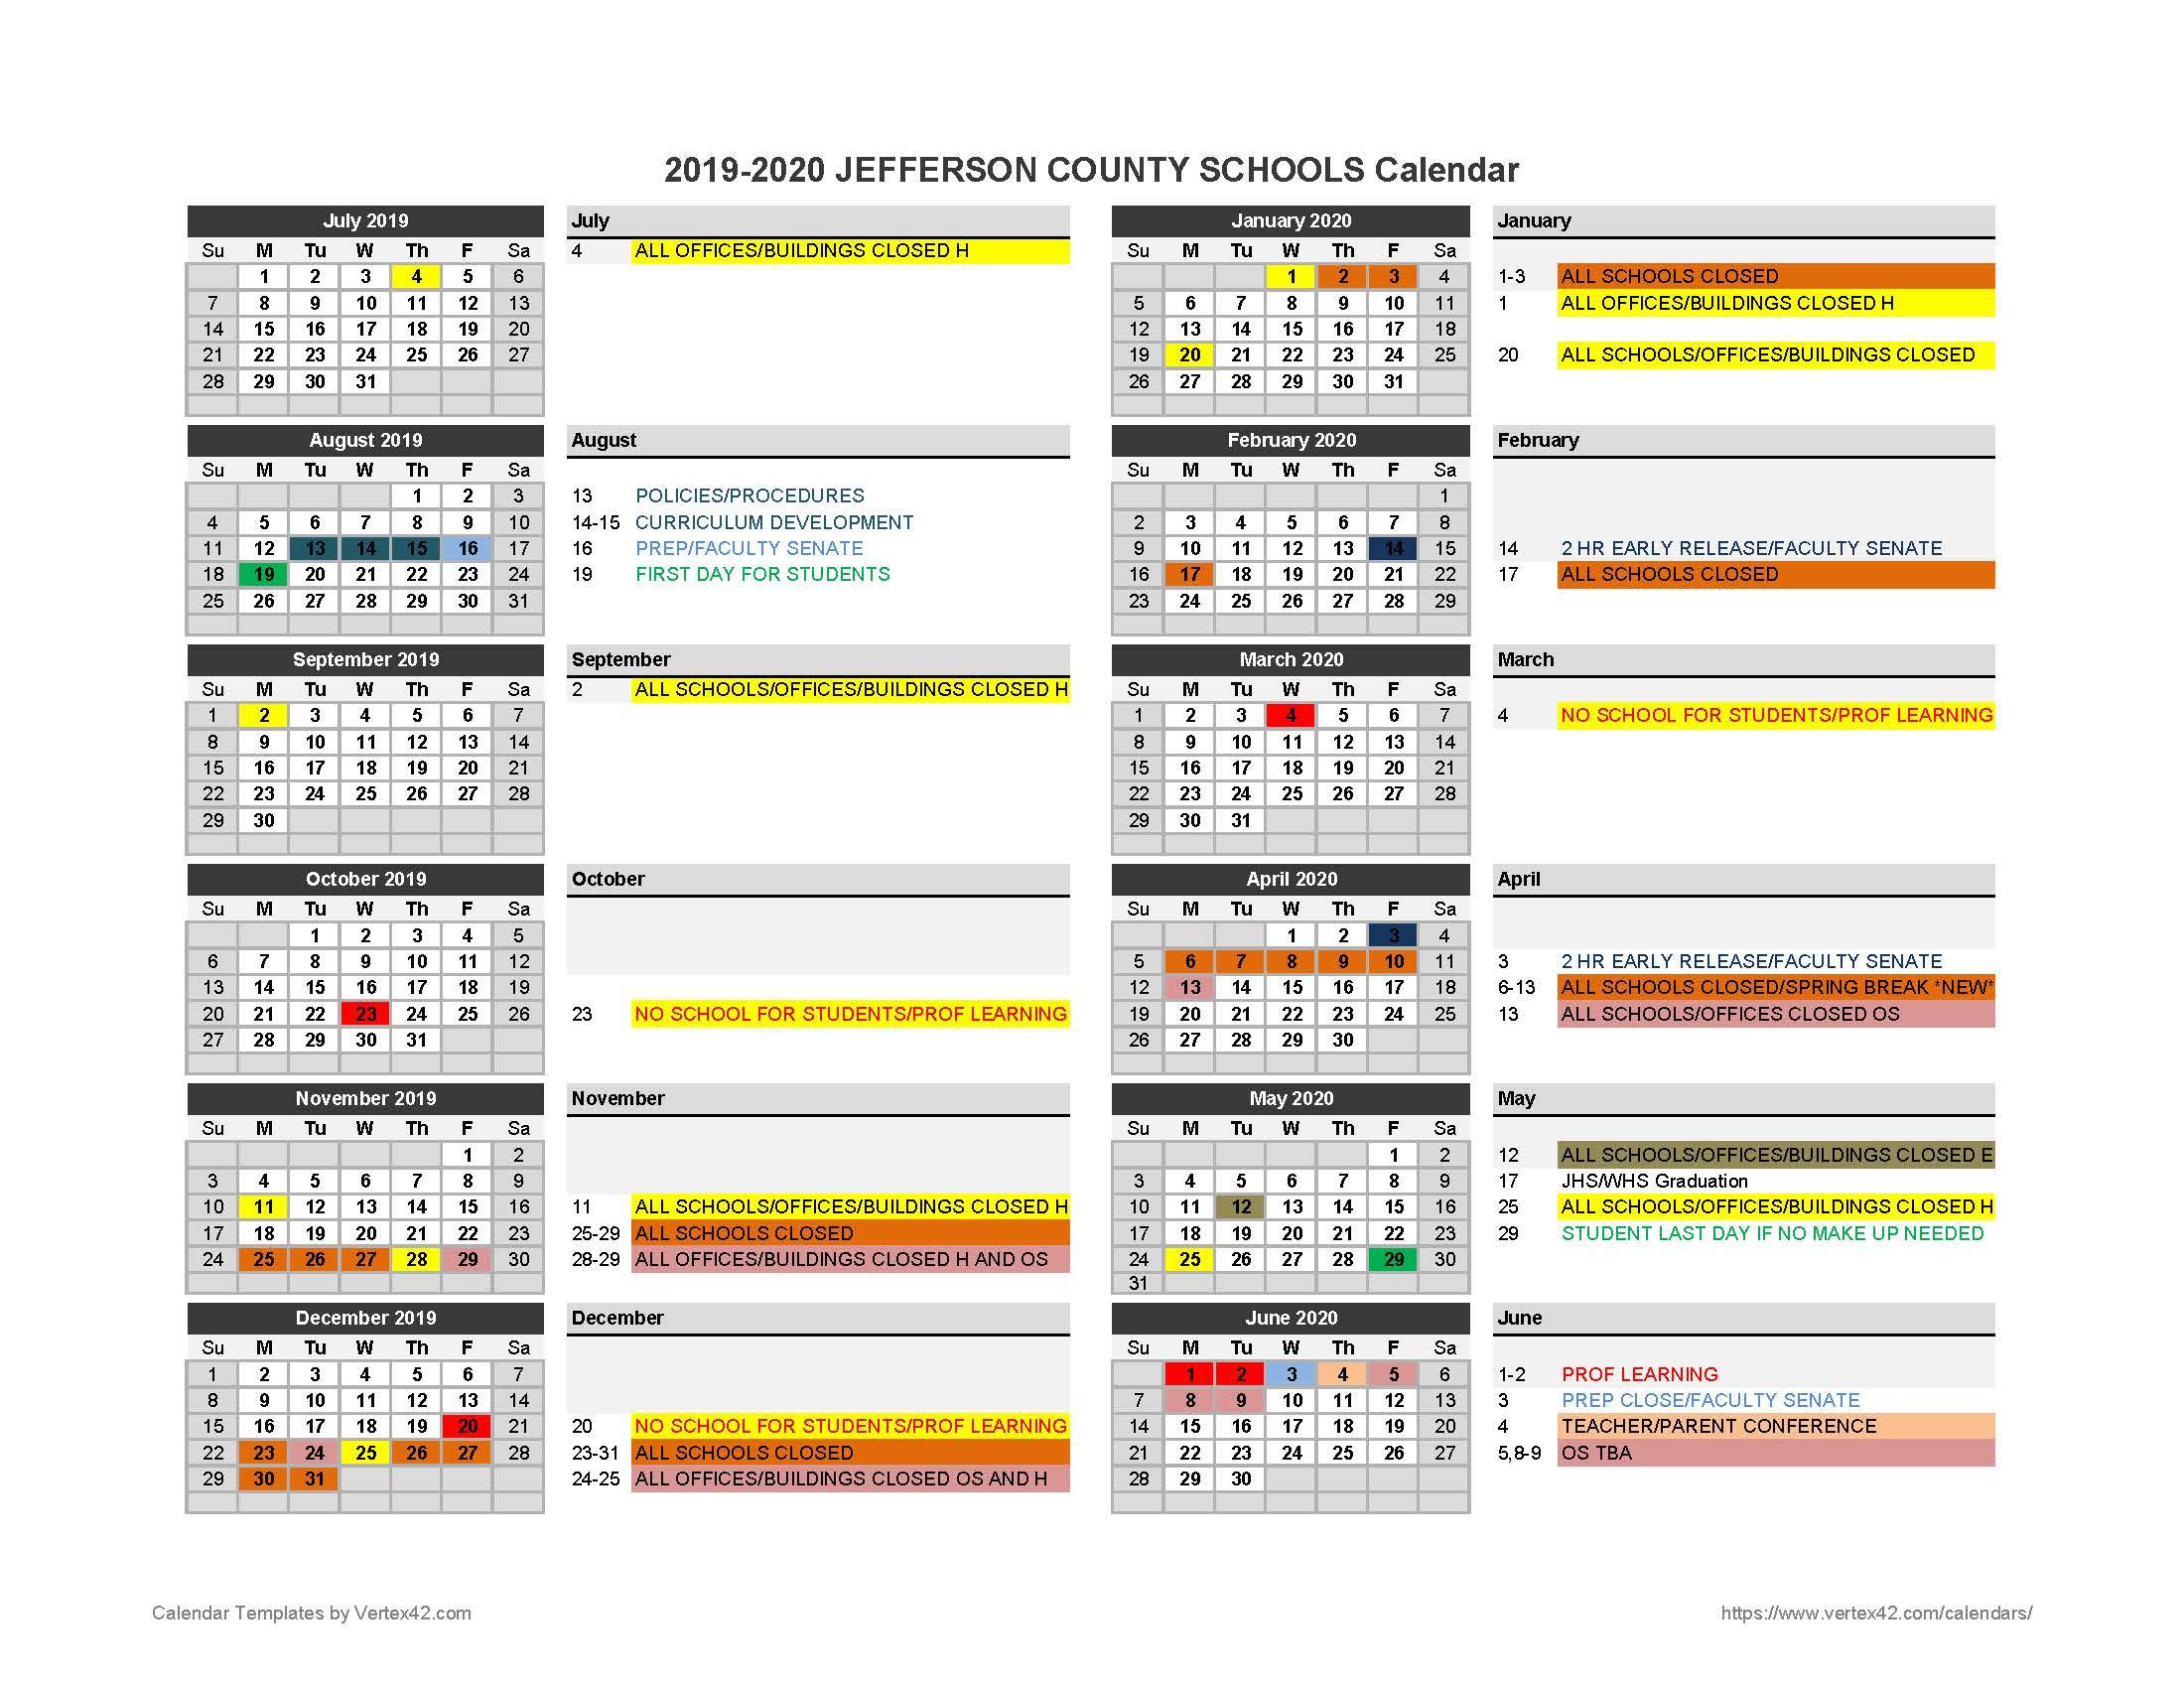 Calendar Amended To Assist Students, Staff  Jefferson with regard to Uc Berkeley Payroll Calendar 2020